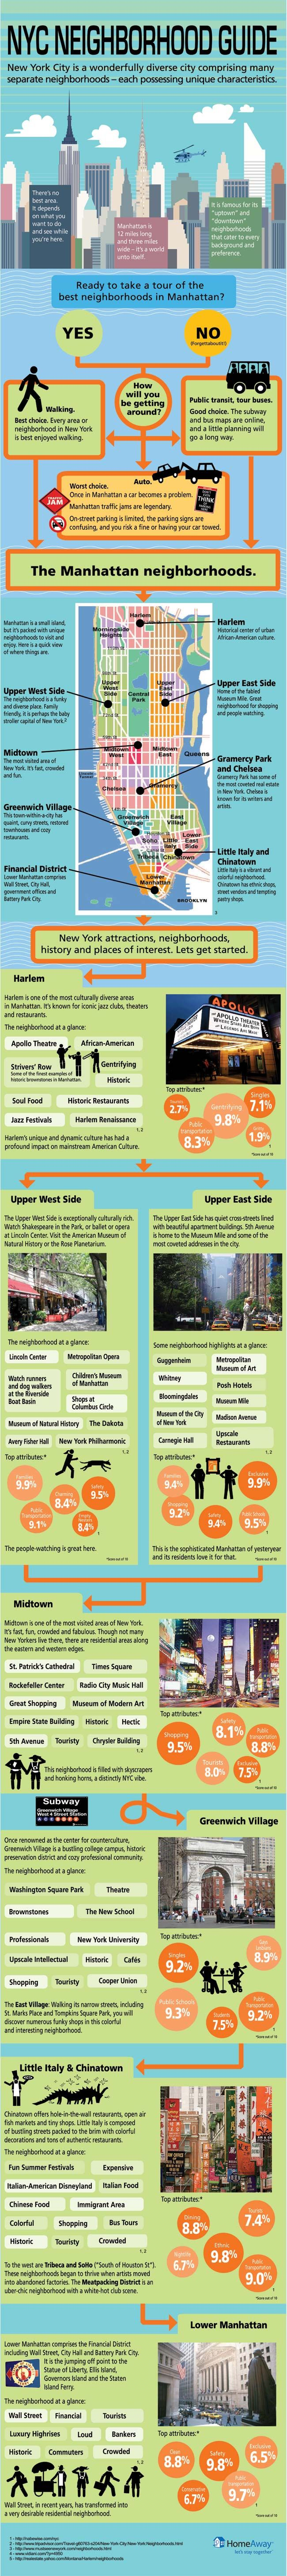 NYC Neighborhood Guide - Visit